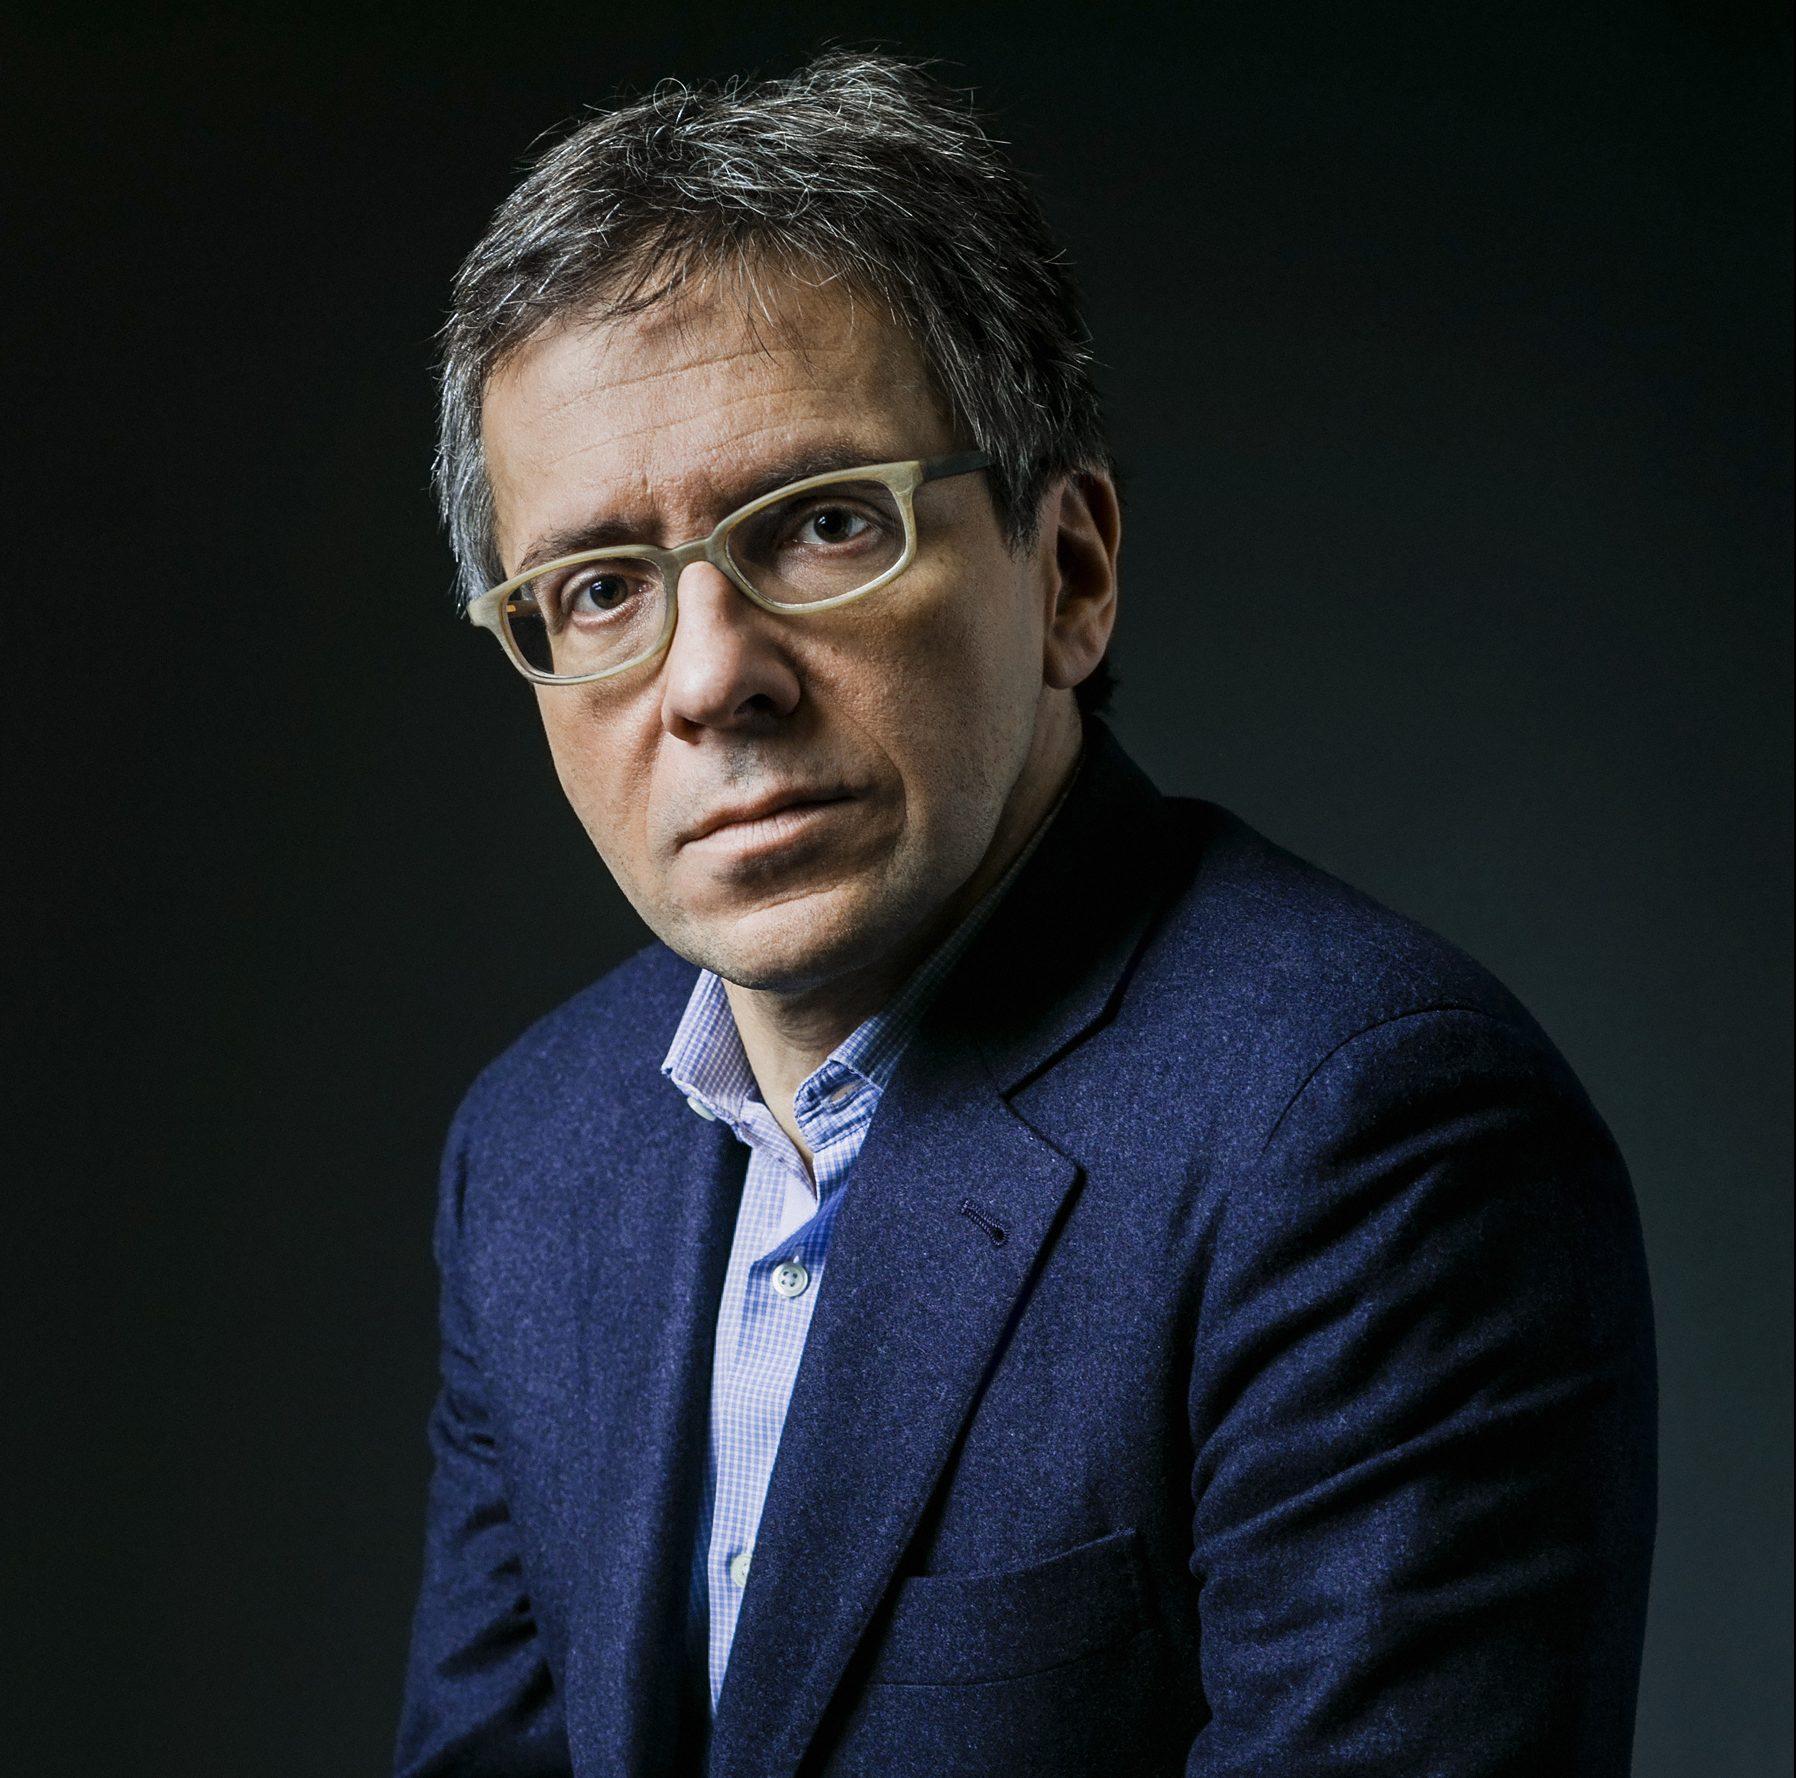 Dr. Ian Bremmer - Concordia